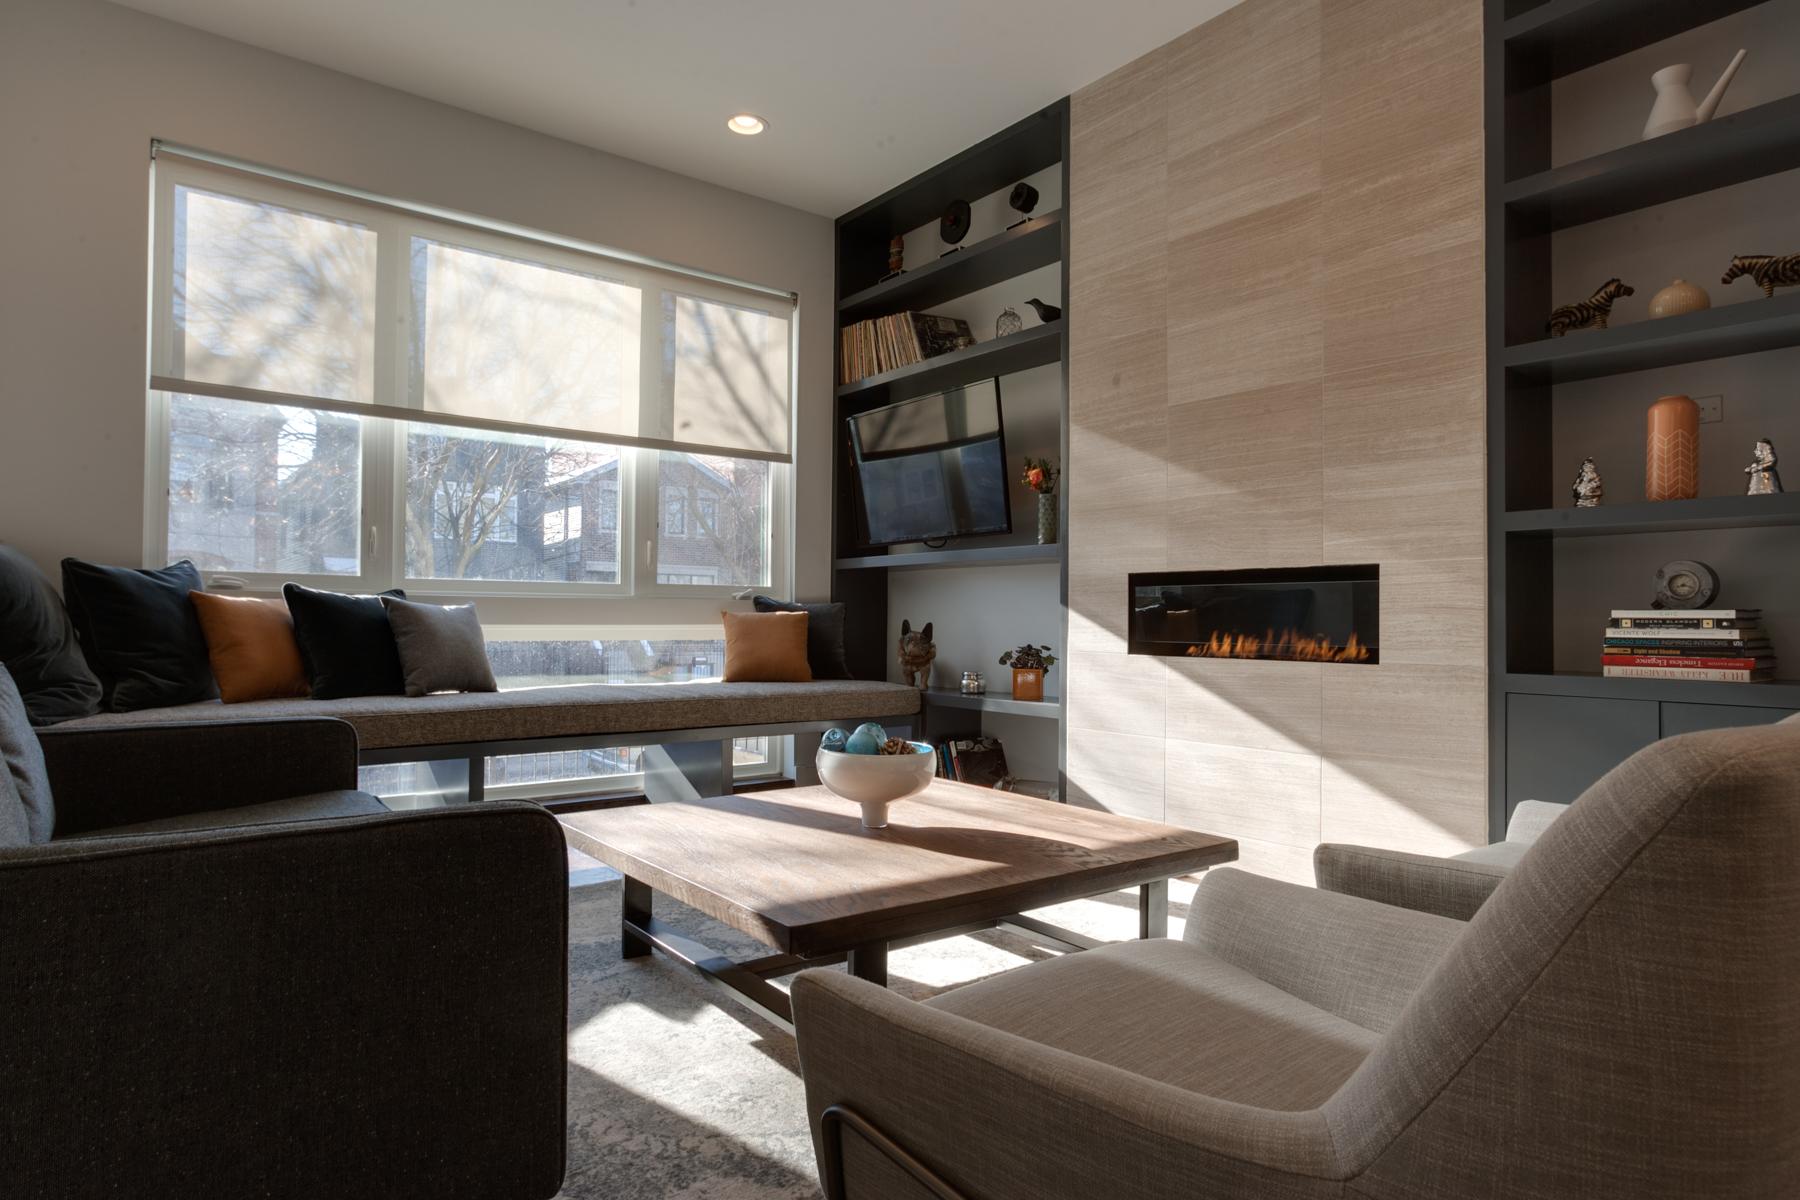 Interiors-7.jpg